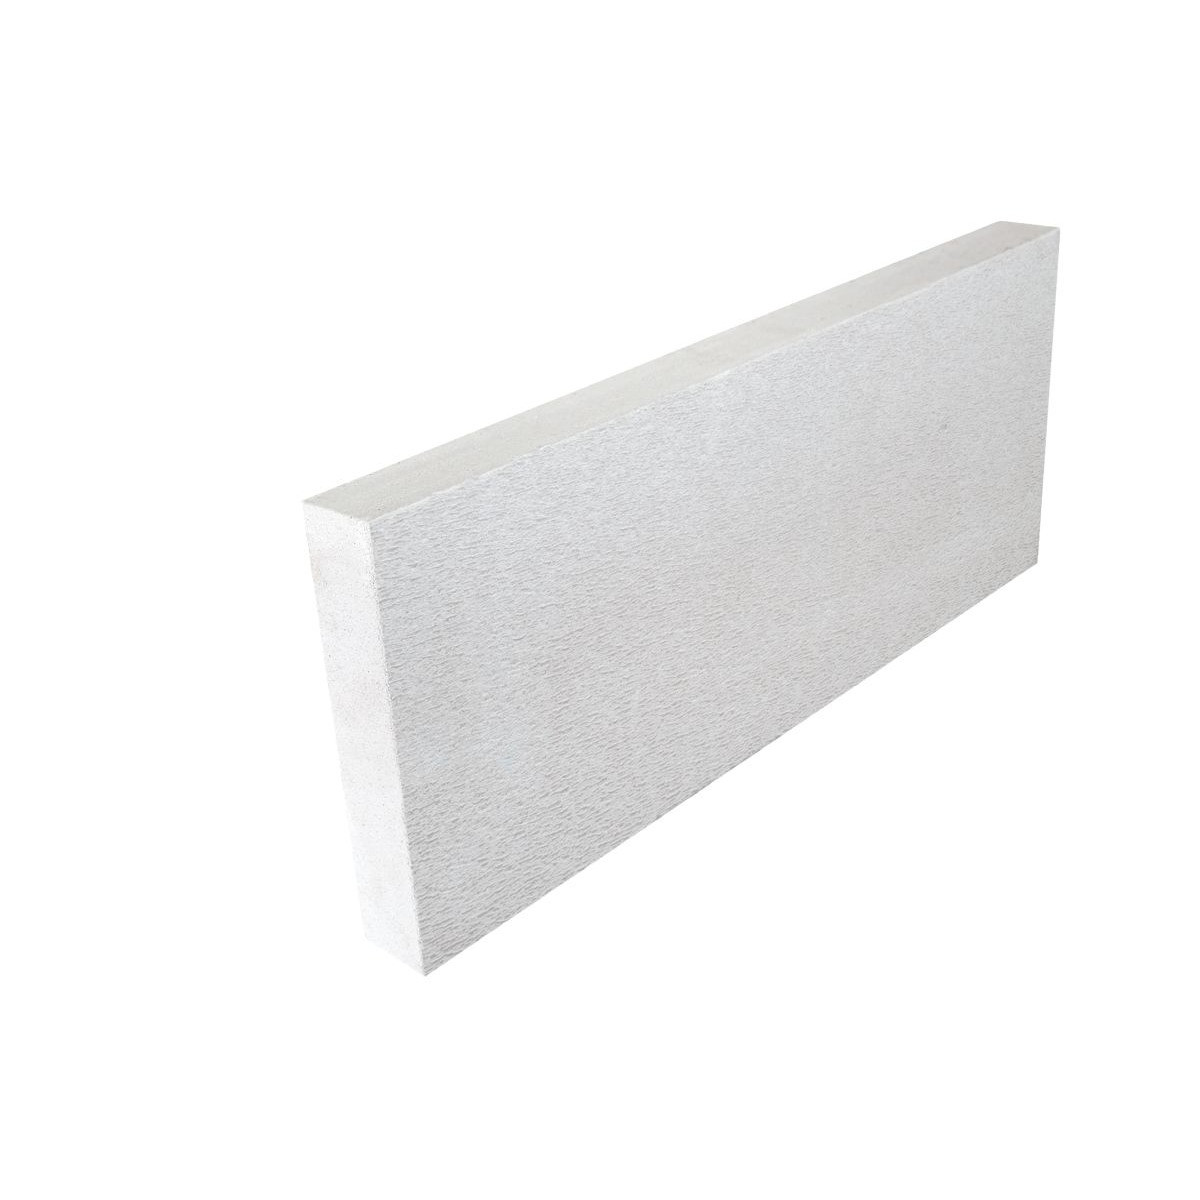 Блок из ячеист.бетона 600х250х50 мм  (поддон-144шт., куб. м. -133 шт.) 3,8кг.